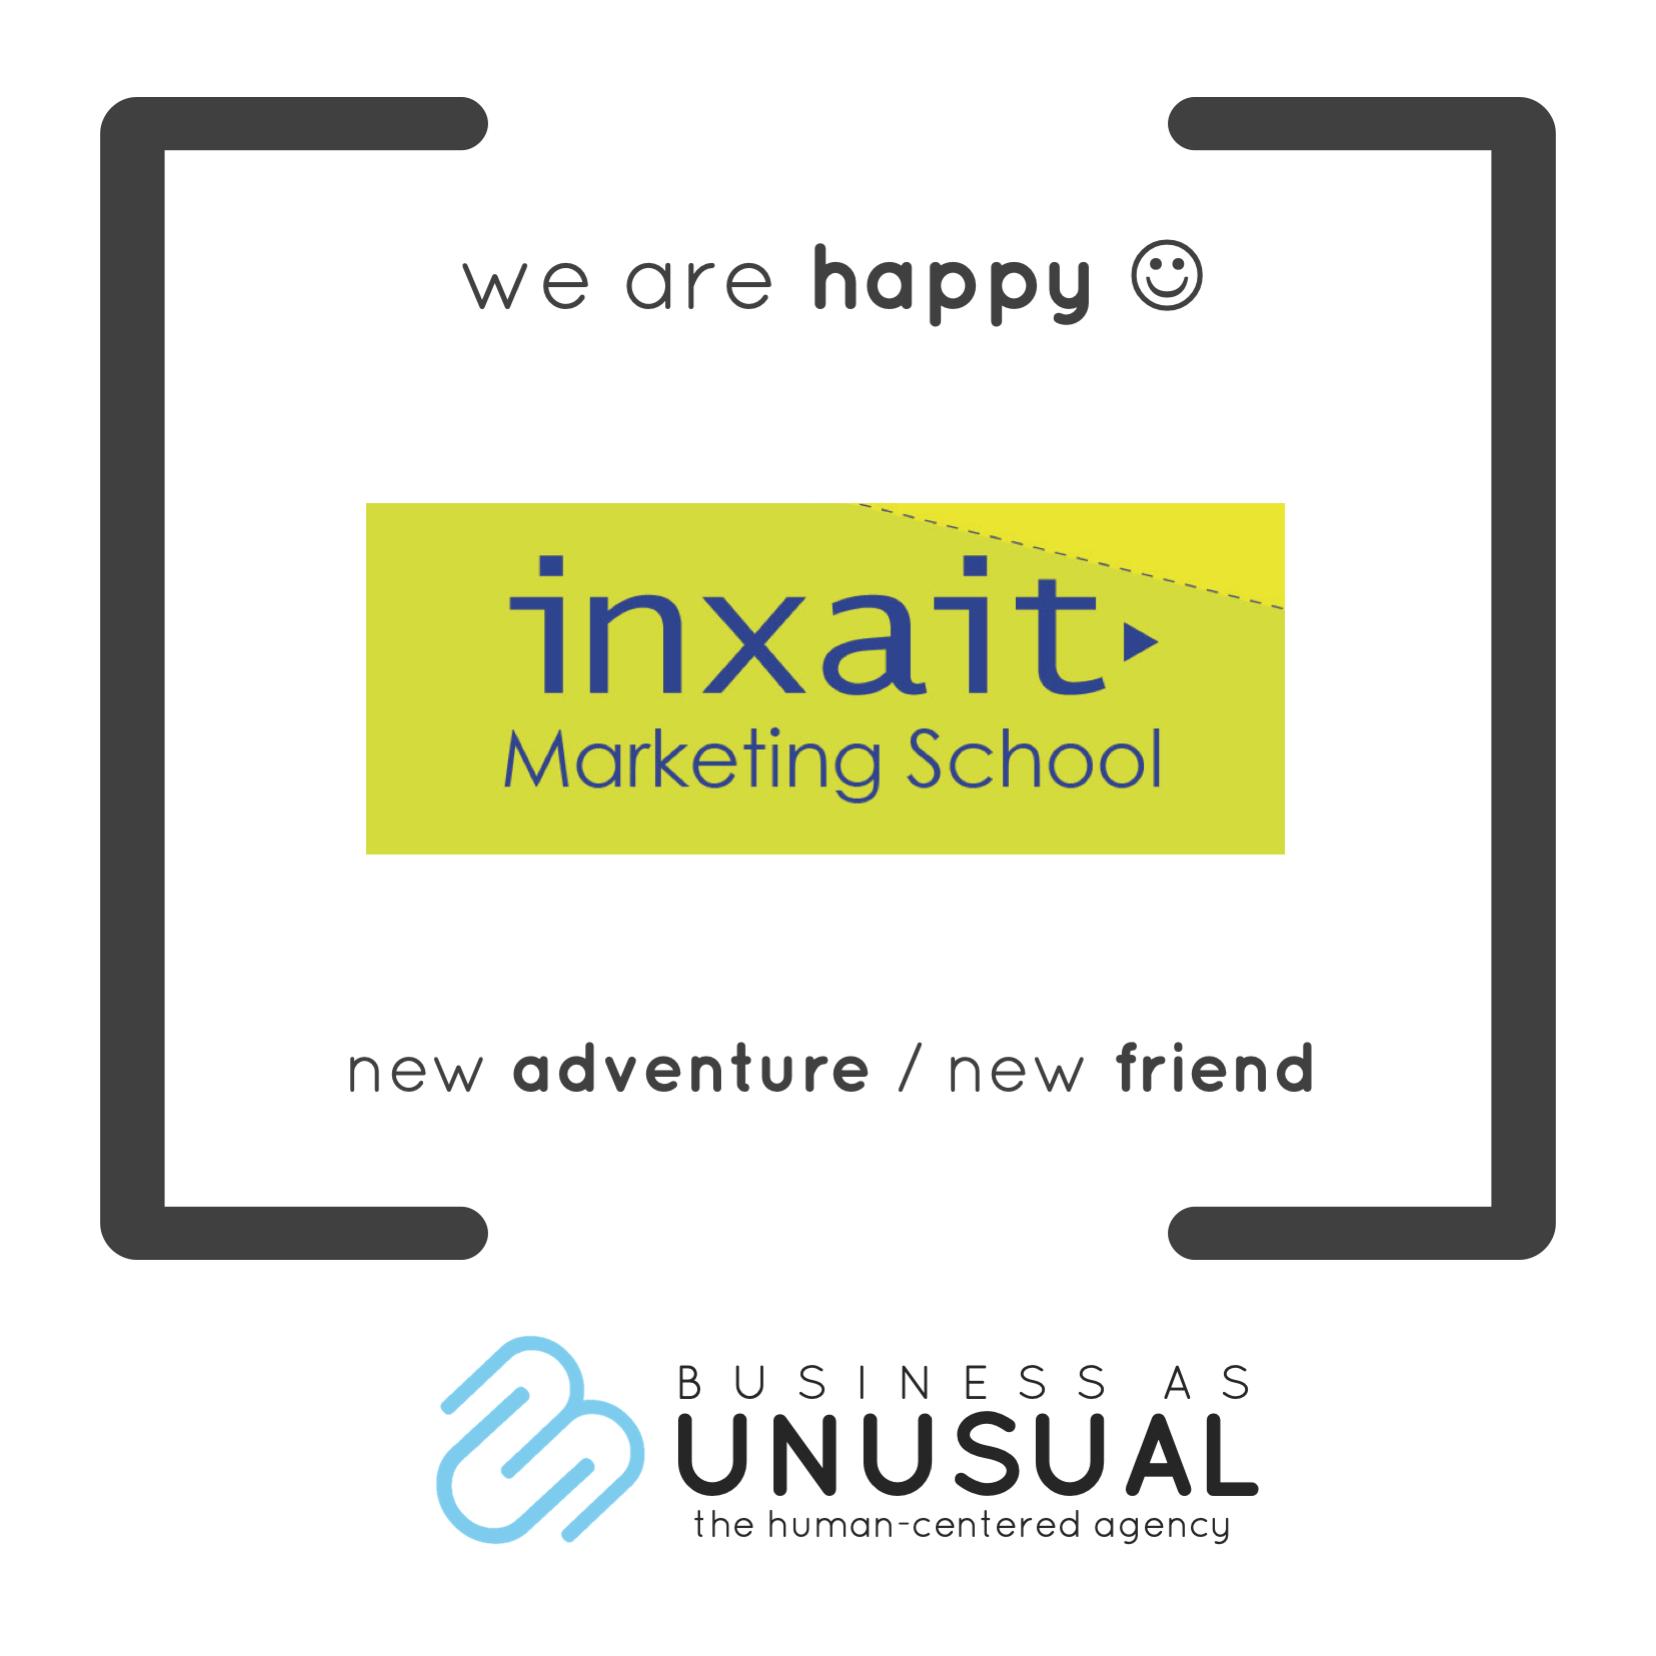 INXAIT Marketing School - Innovation and Marketing Workshops